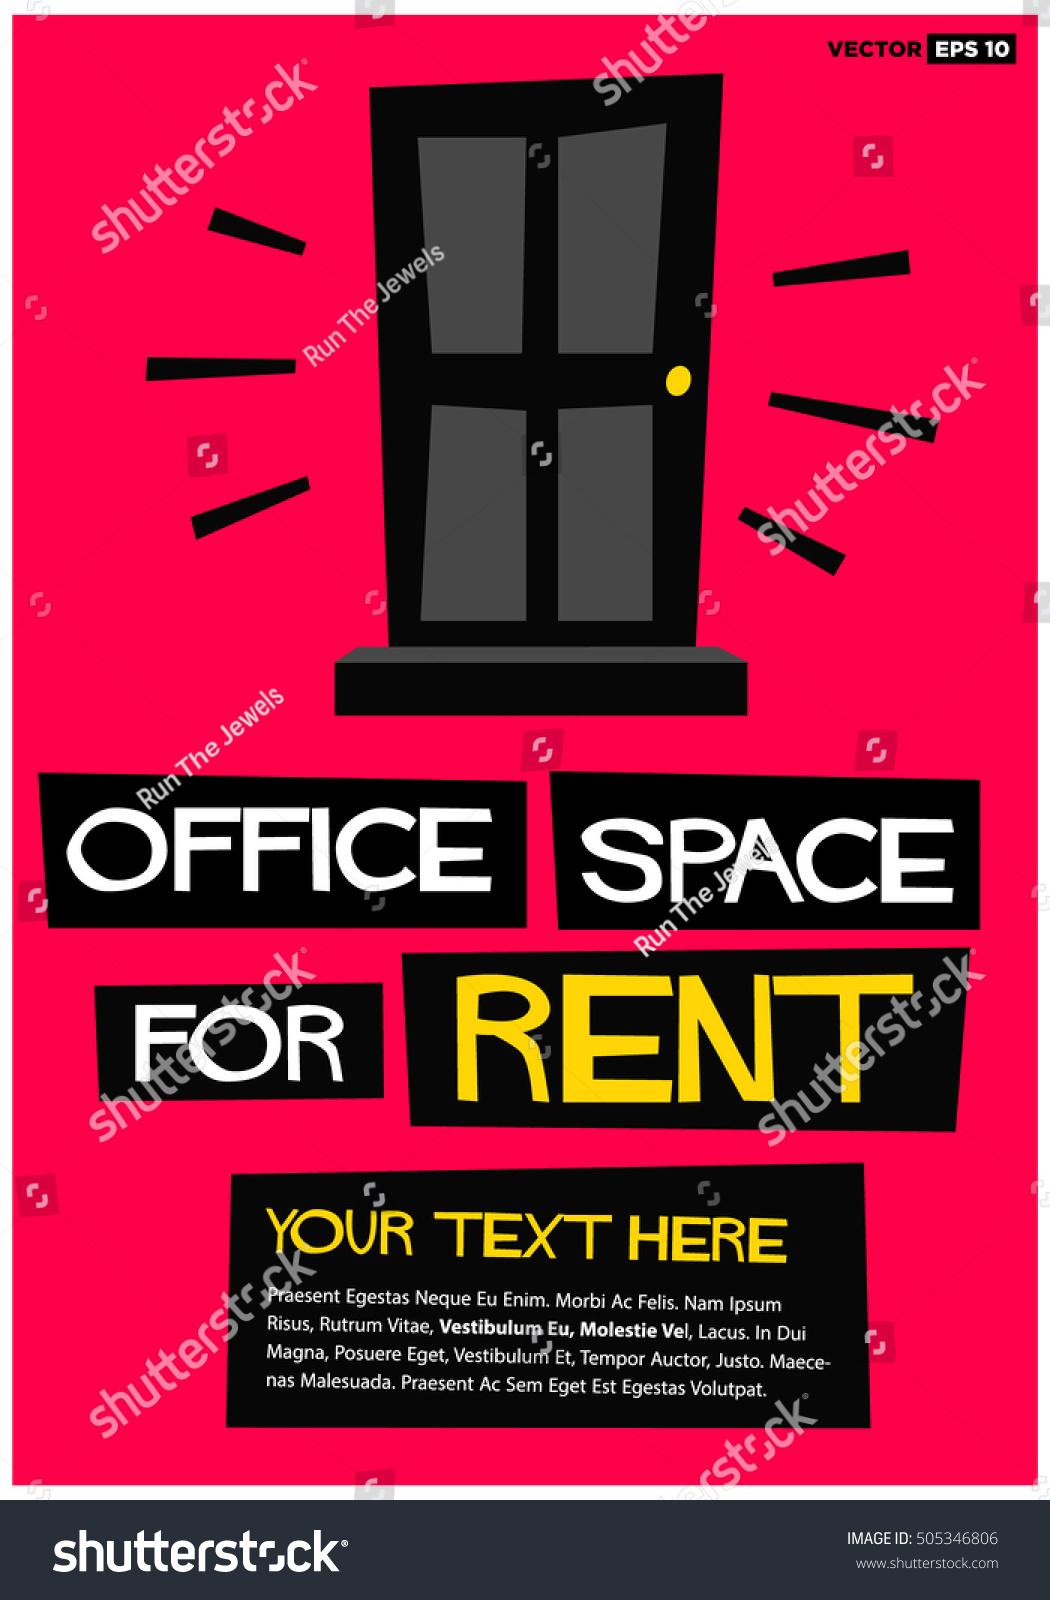 https www shutterstock com image vector office space rent poster banner board 505346806